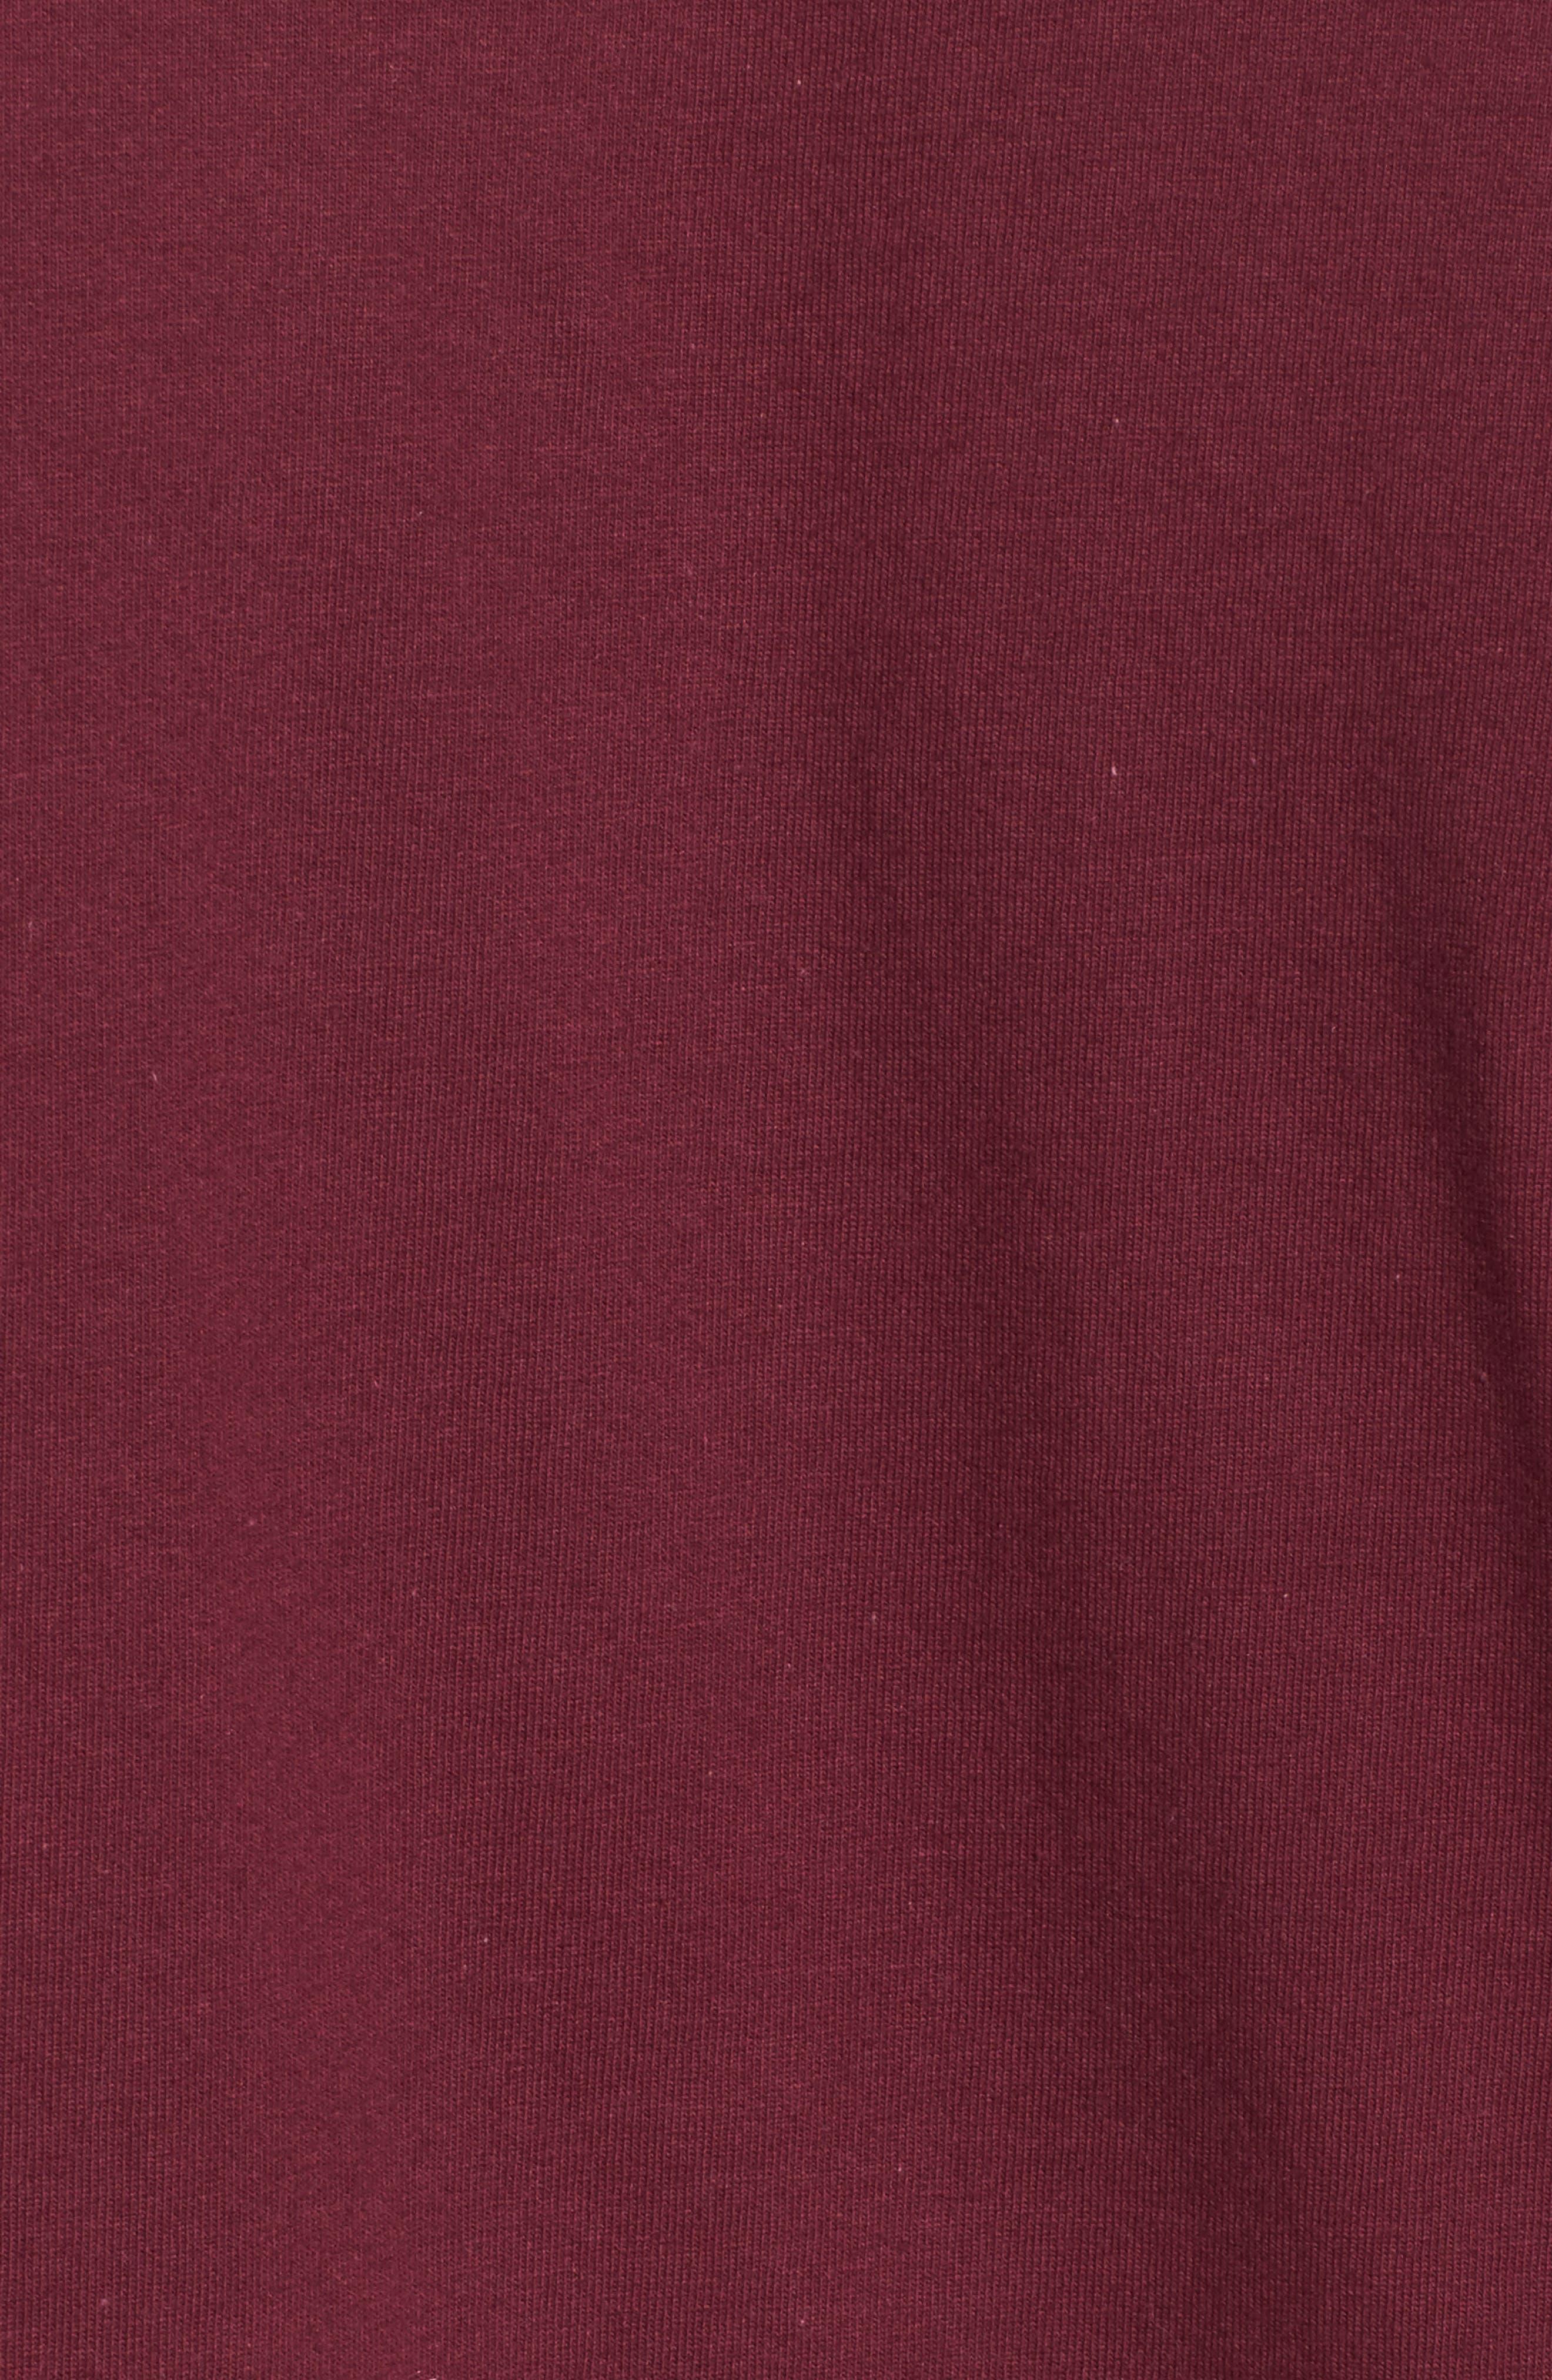 '95 T-Shirt,                             Alternate thumbnail 5, color,                             Navy/ Silver Birch/ White